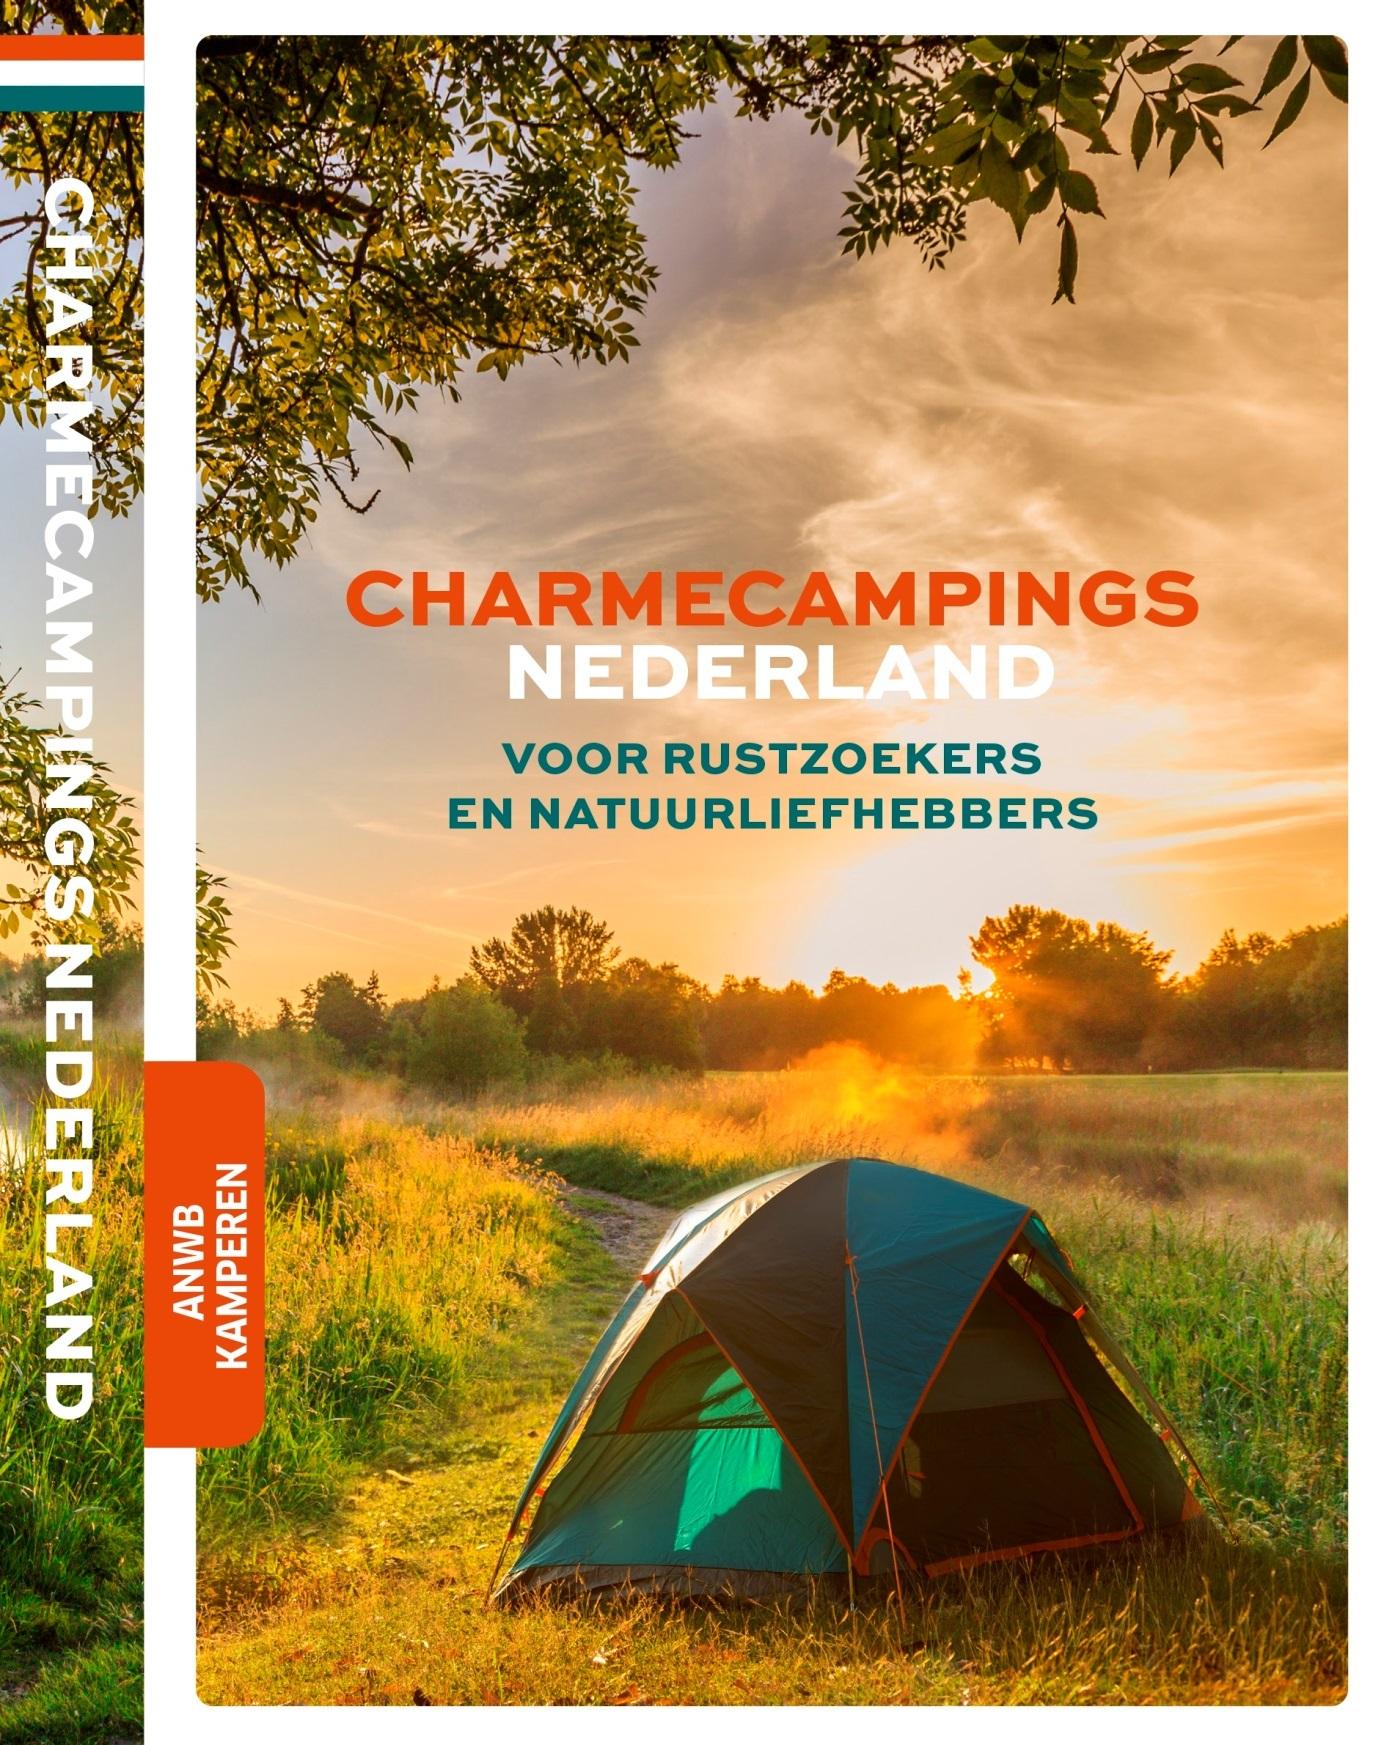 Charmecampings Nederland | ANWB campinggids 9789018047795  ANWB ANWB Campinggidsen  Campinggidsen Nederland